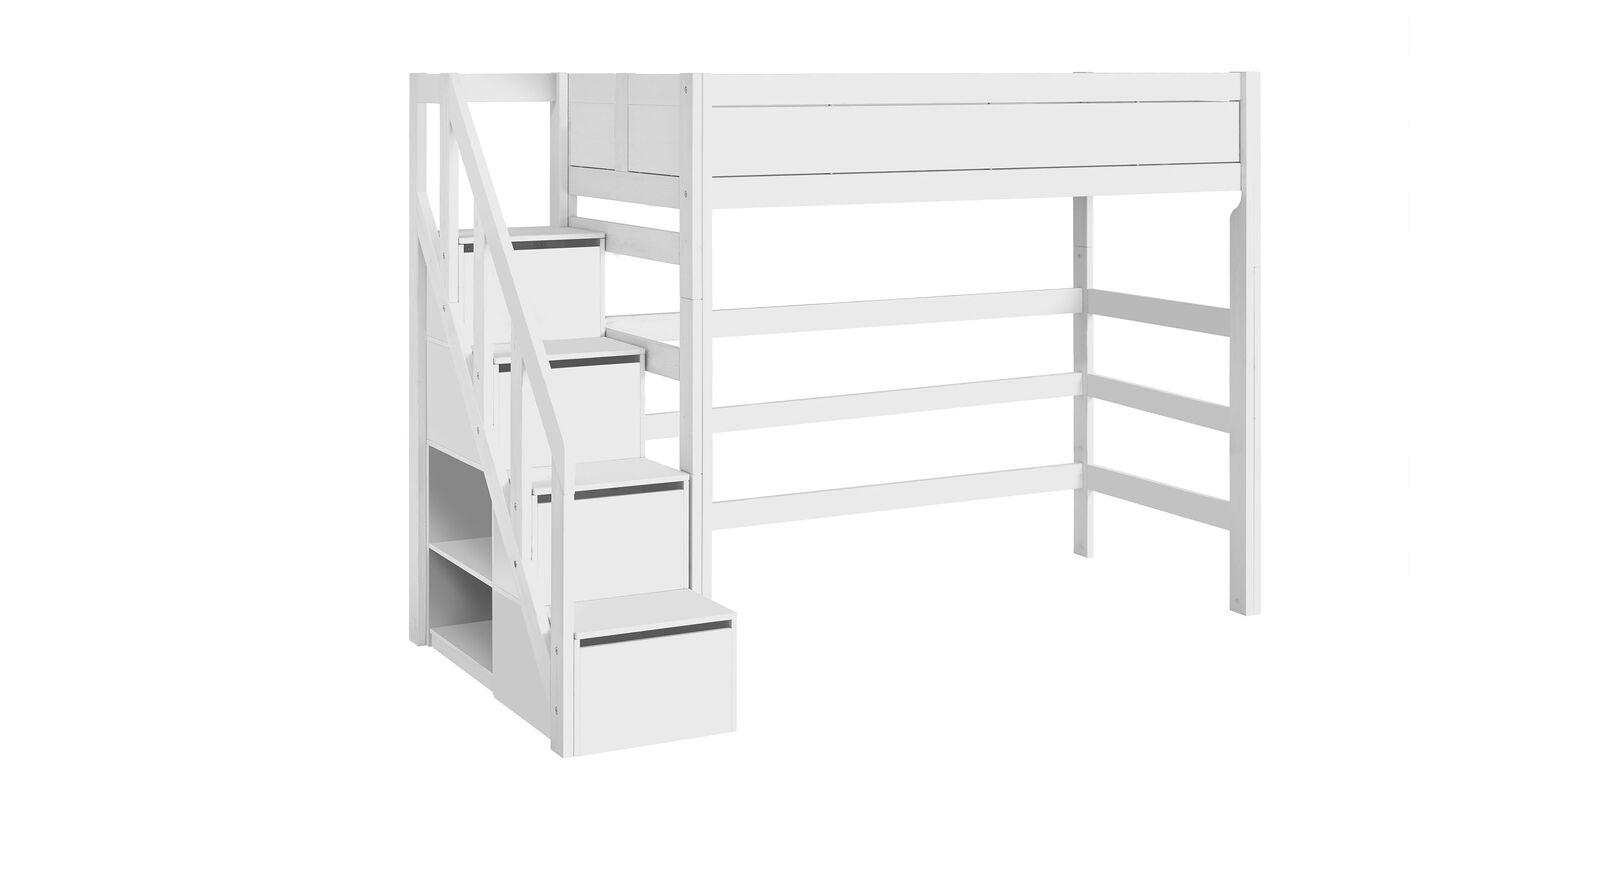 LIFETIME Hochbett Original in Weiß lackiert